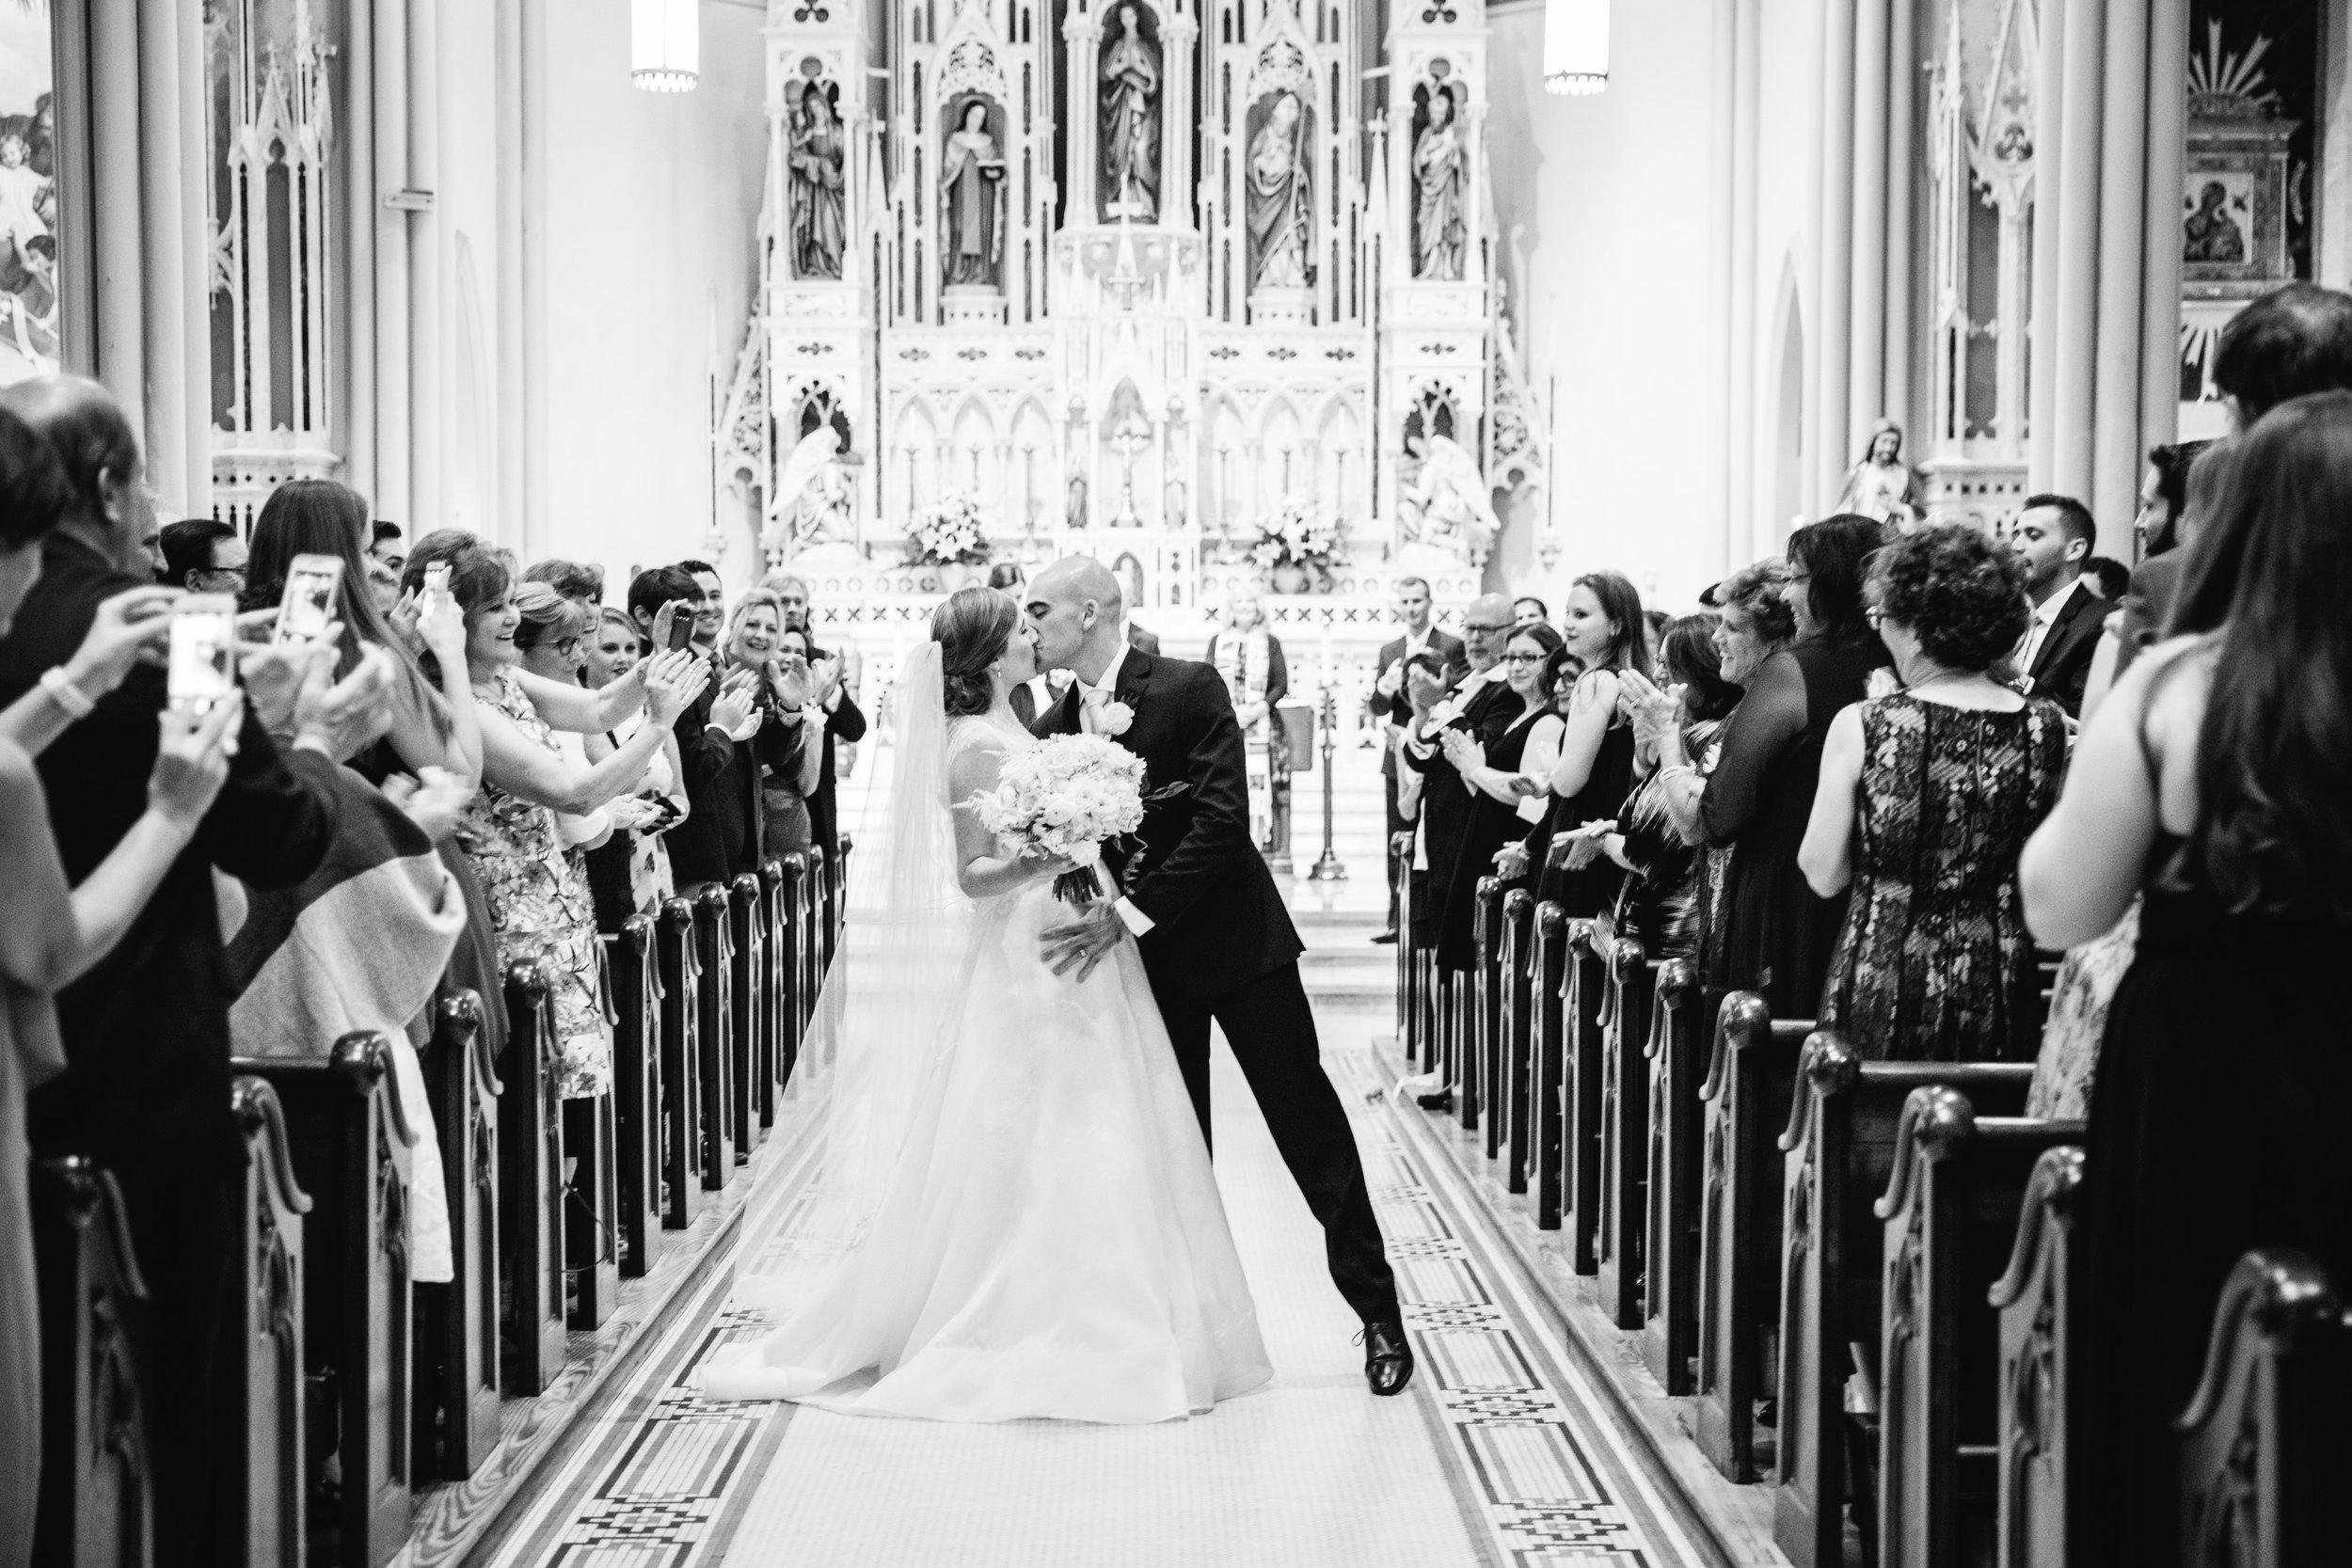 042-MA17_St-Marys-Catholic-Church-Annapolis-Wedding.jpg